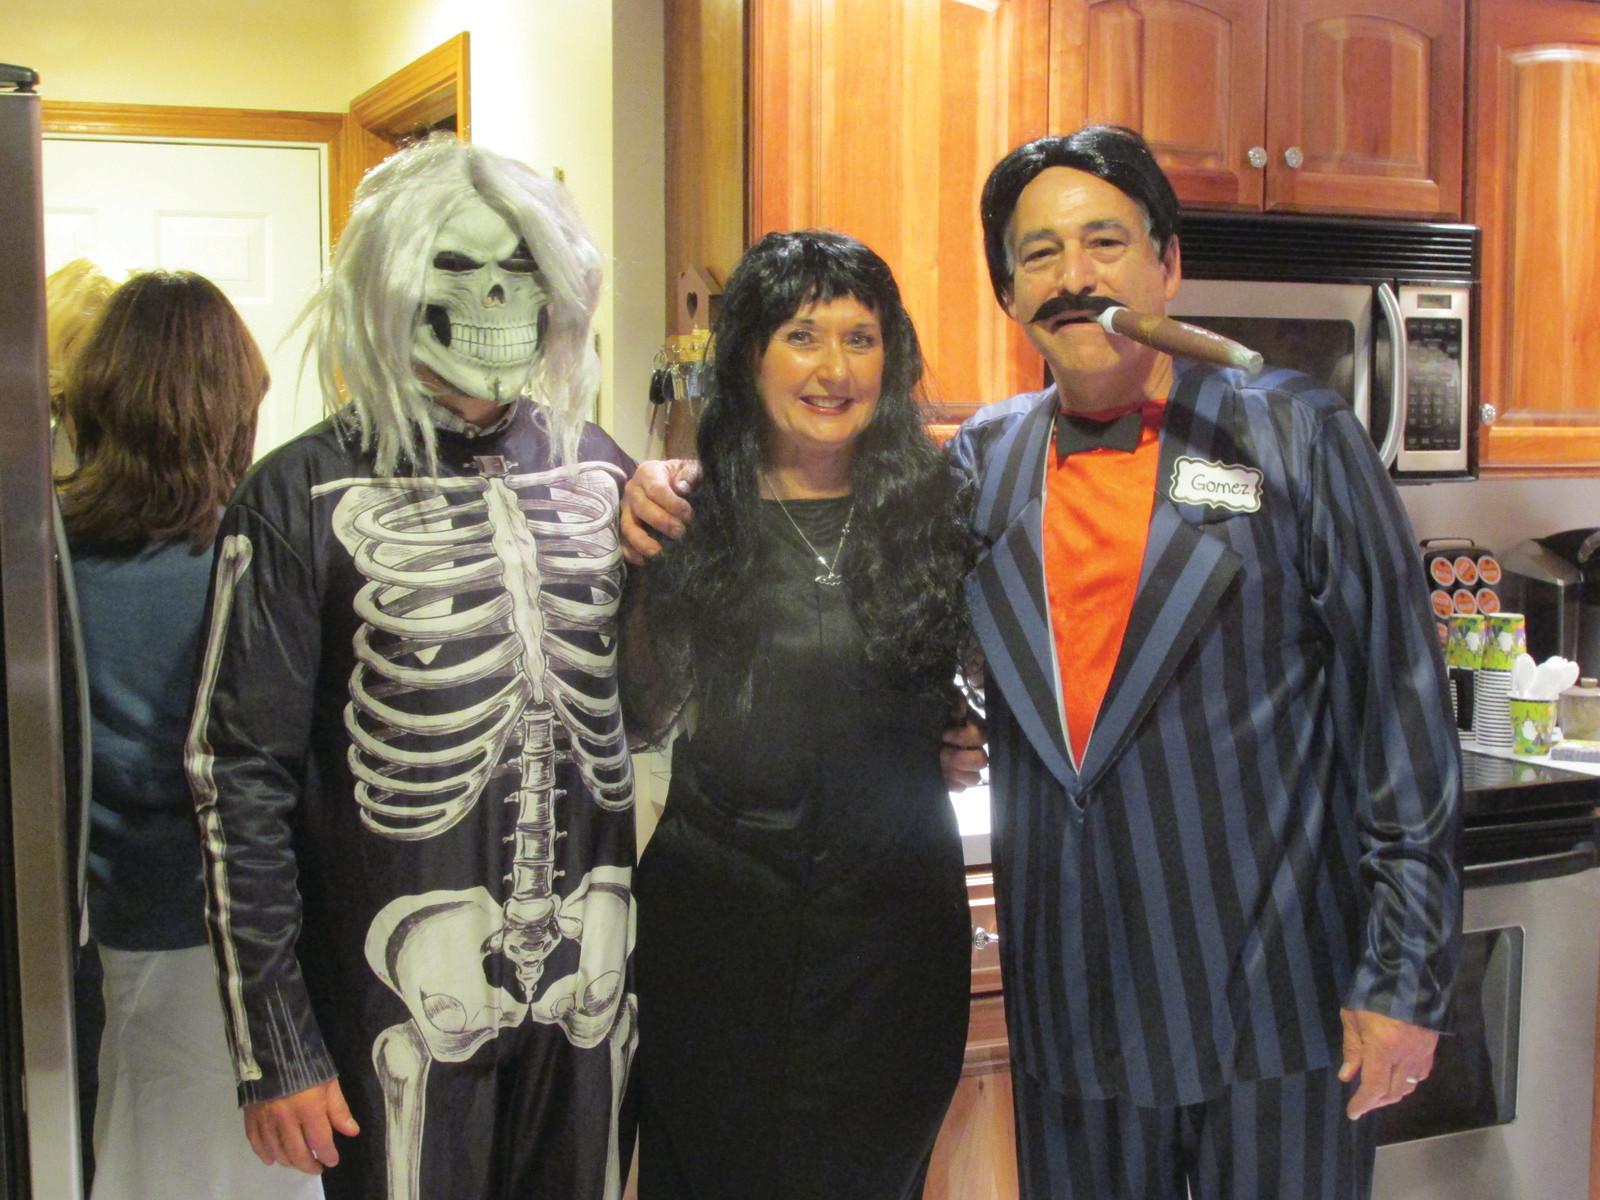 Addams Family Anthony Ursillo Joins Mathew Quirk Marissa Mahoney Carol Iovino And Mike